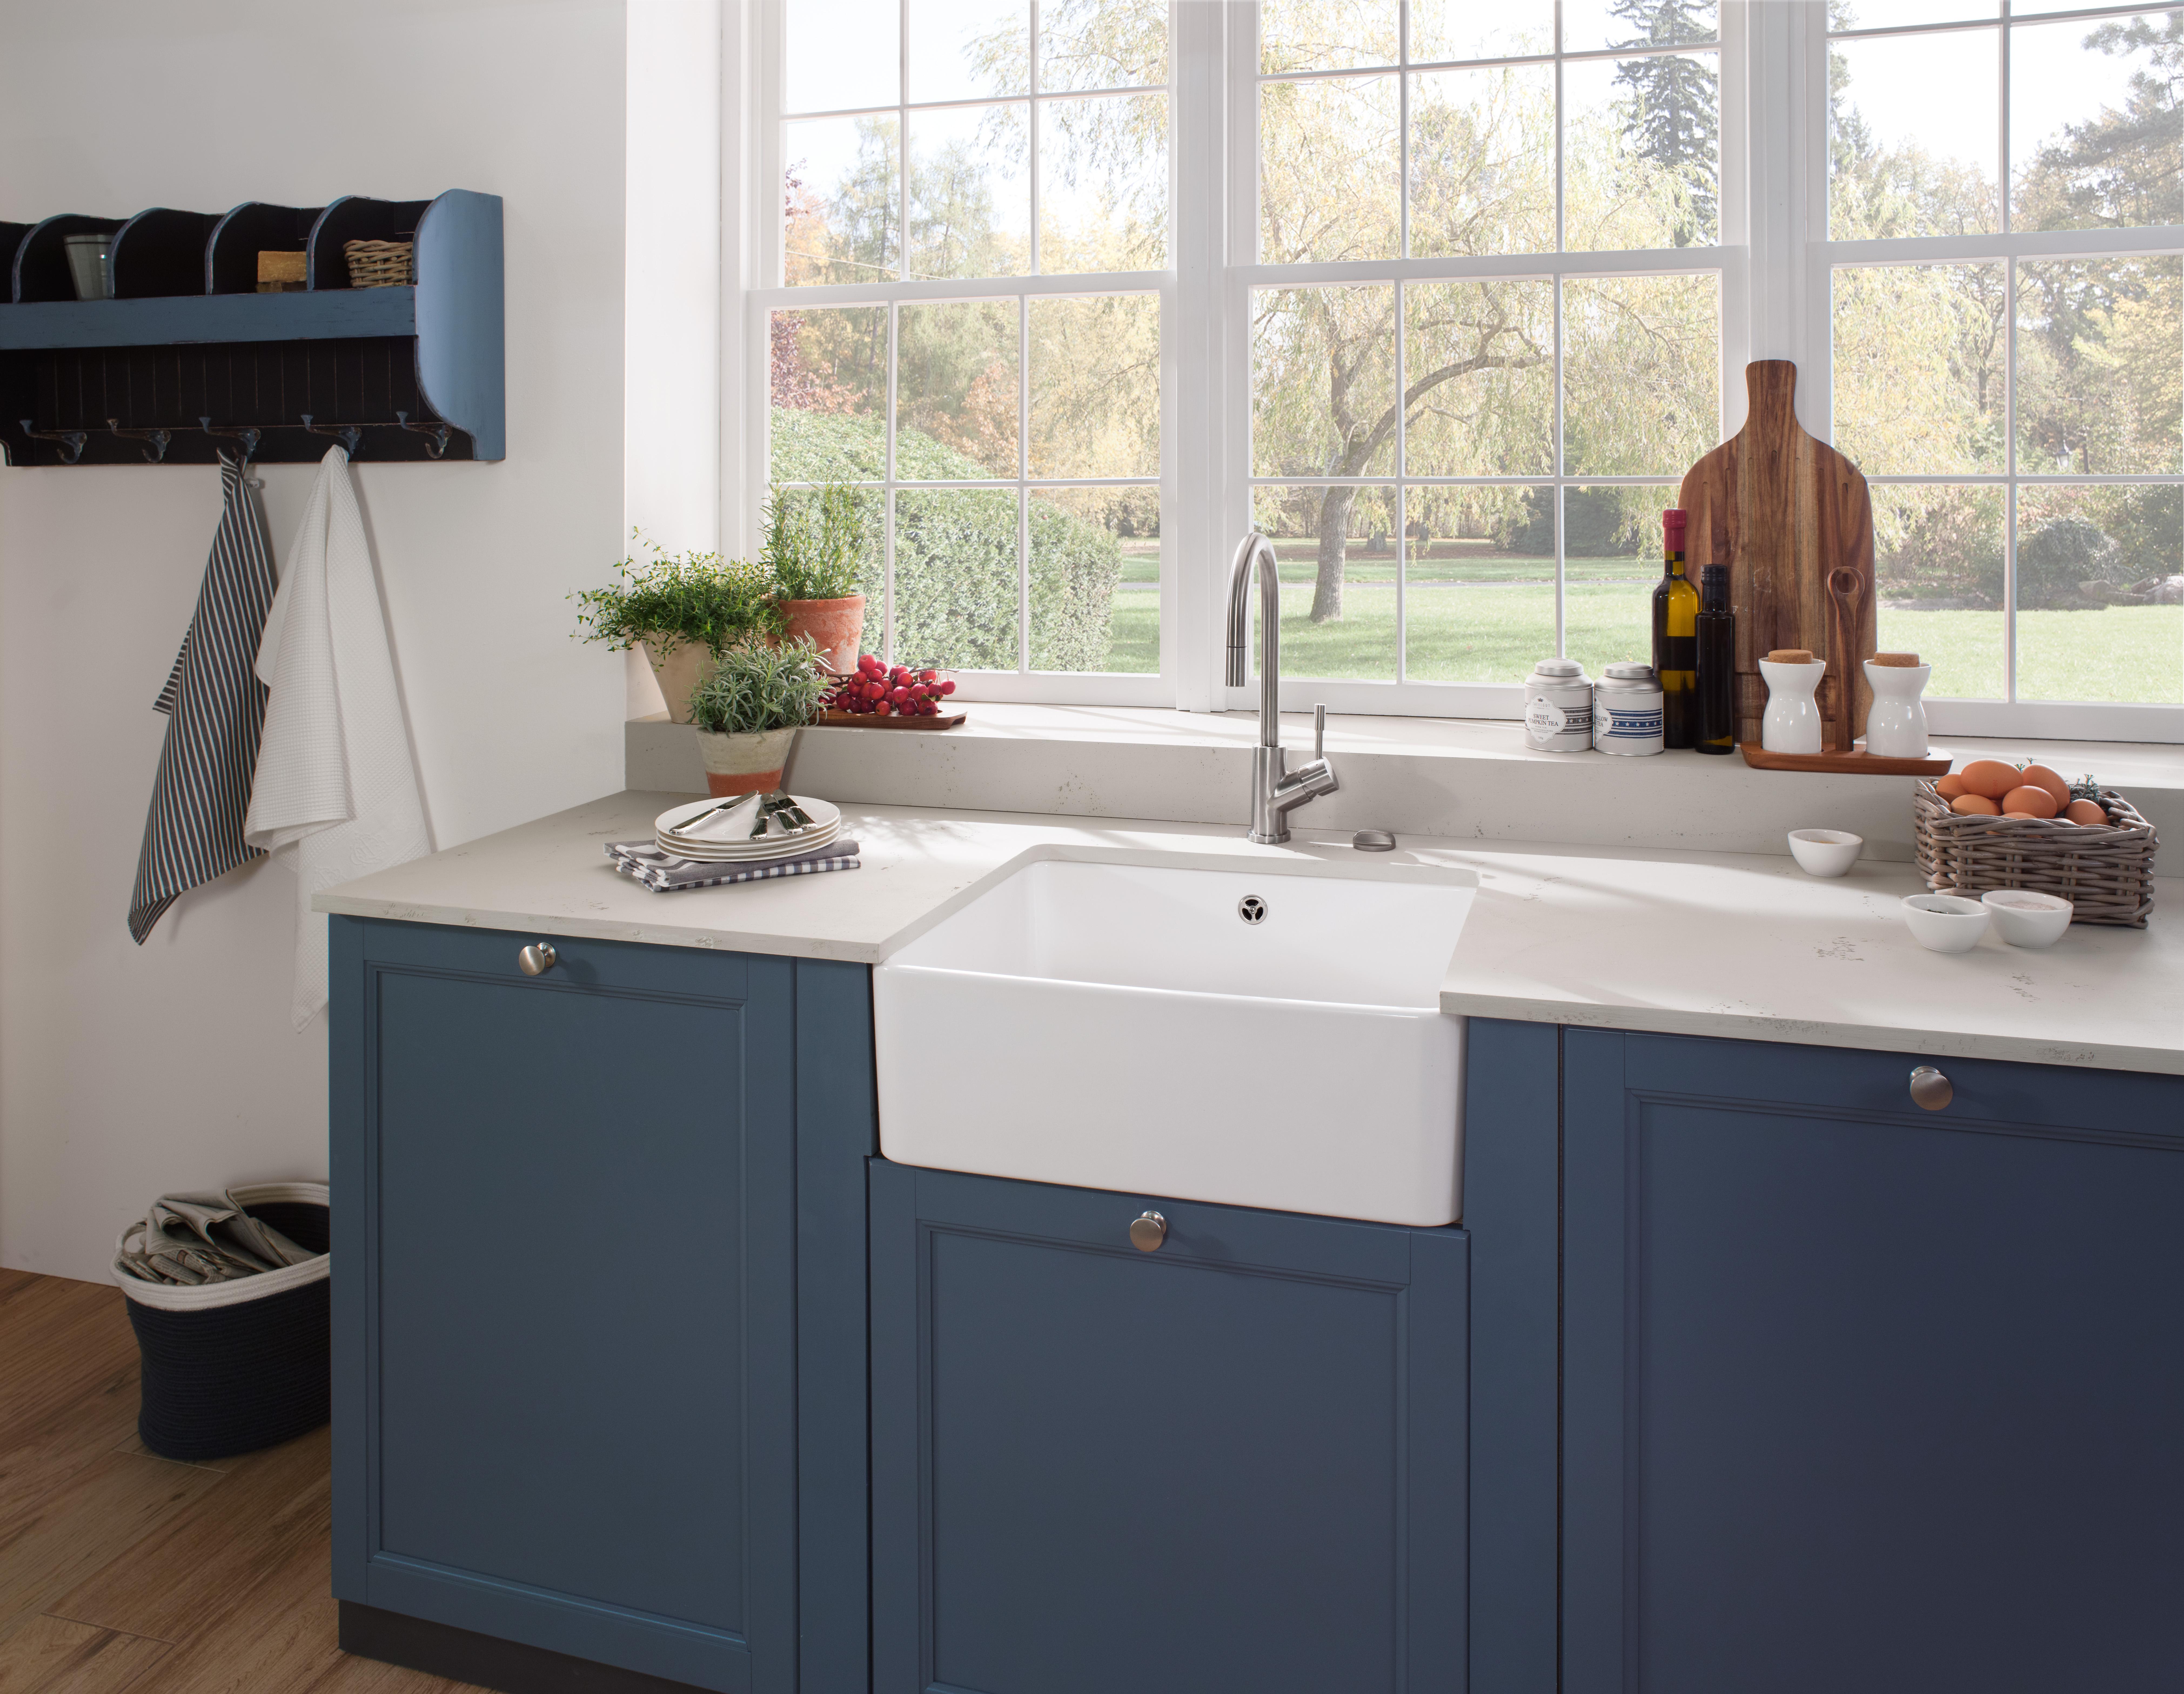 Sink unit Commercial model, Commercial models, Accessories